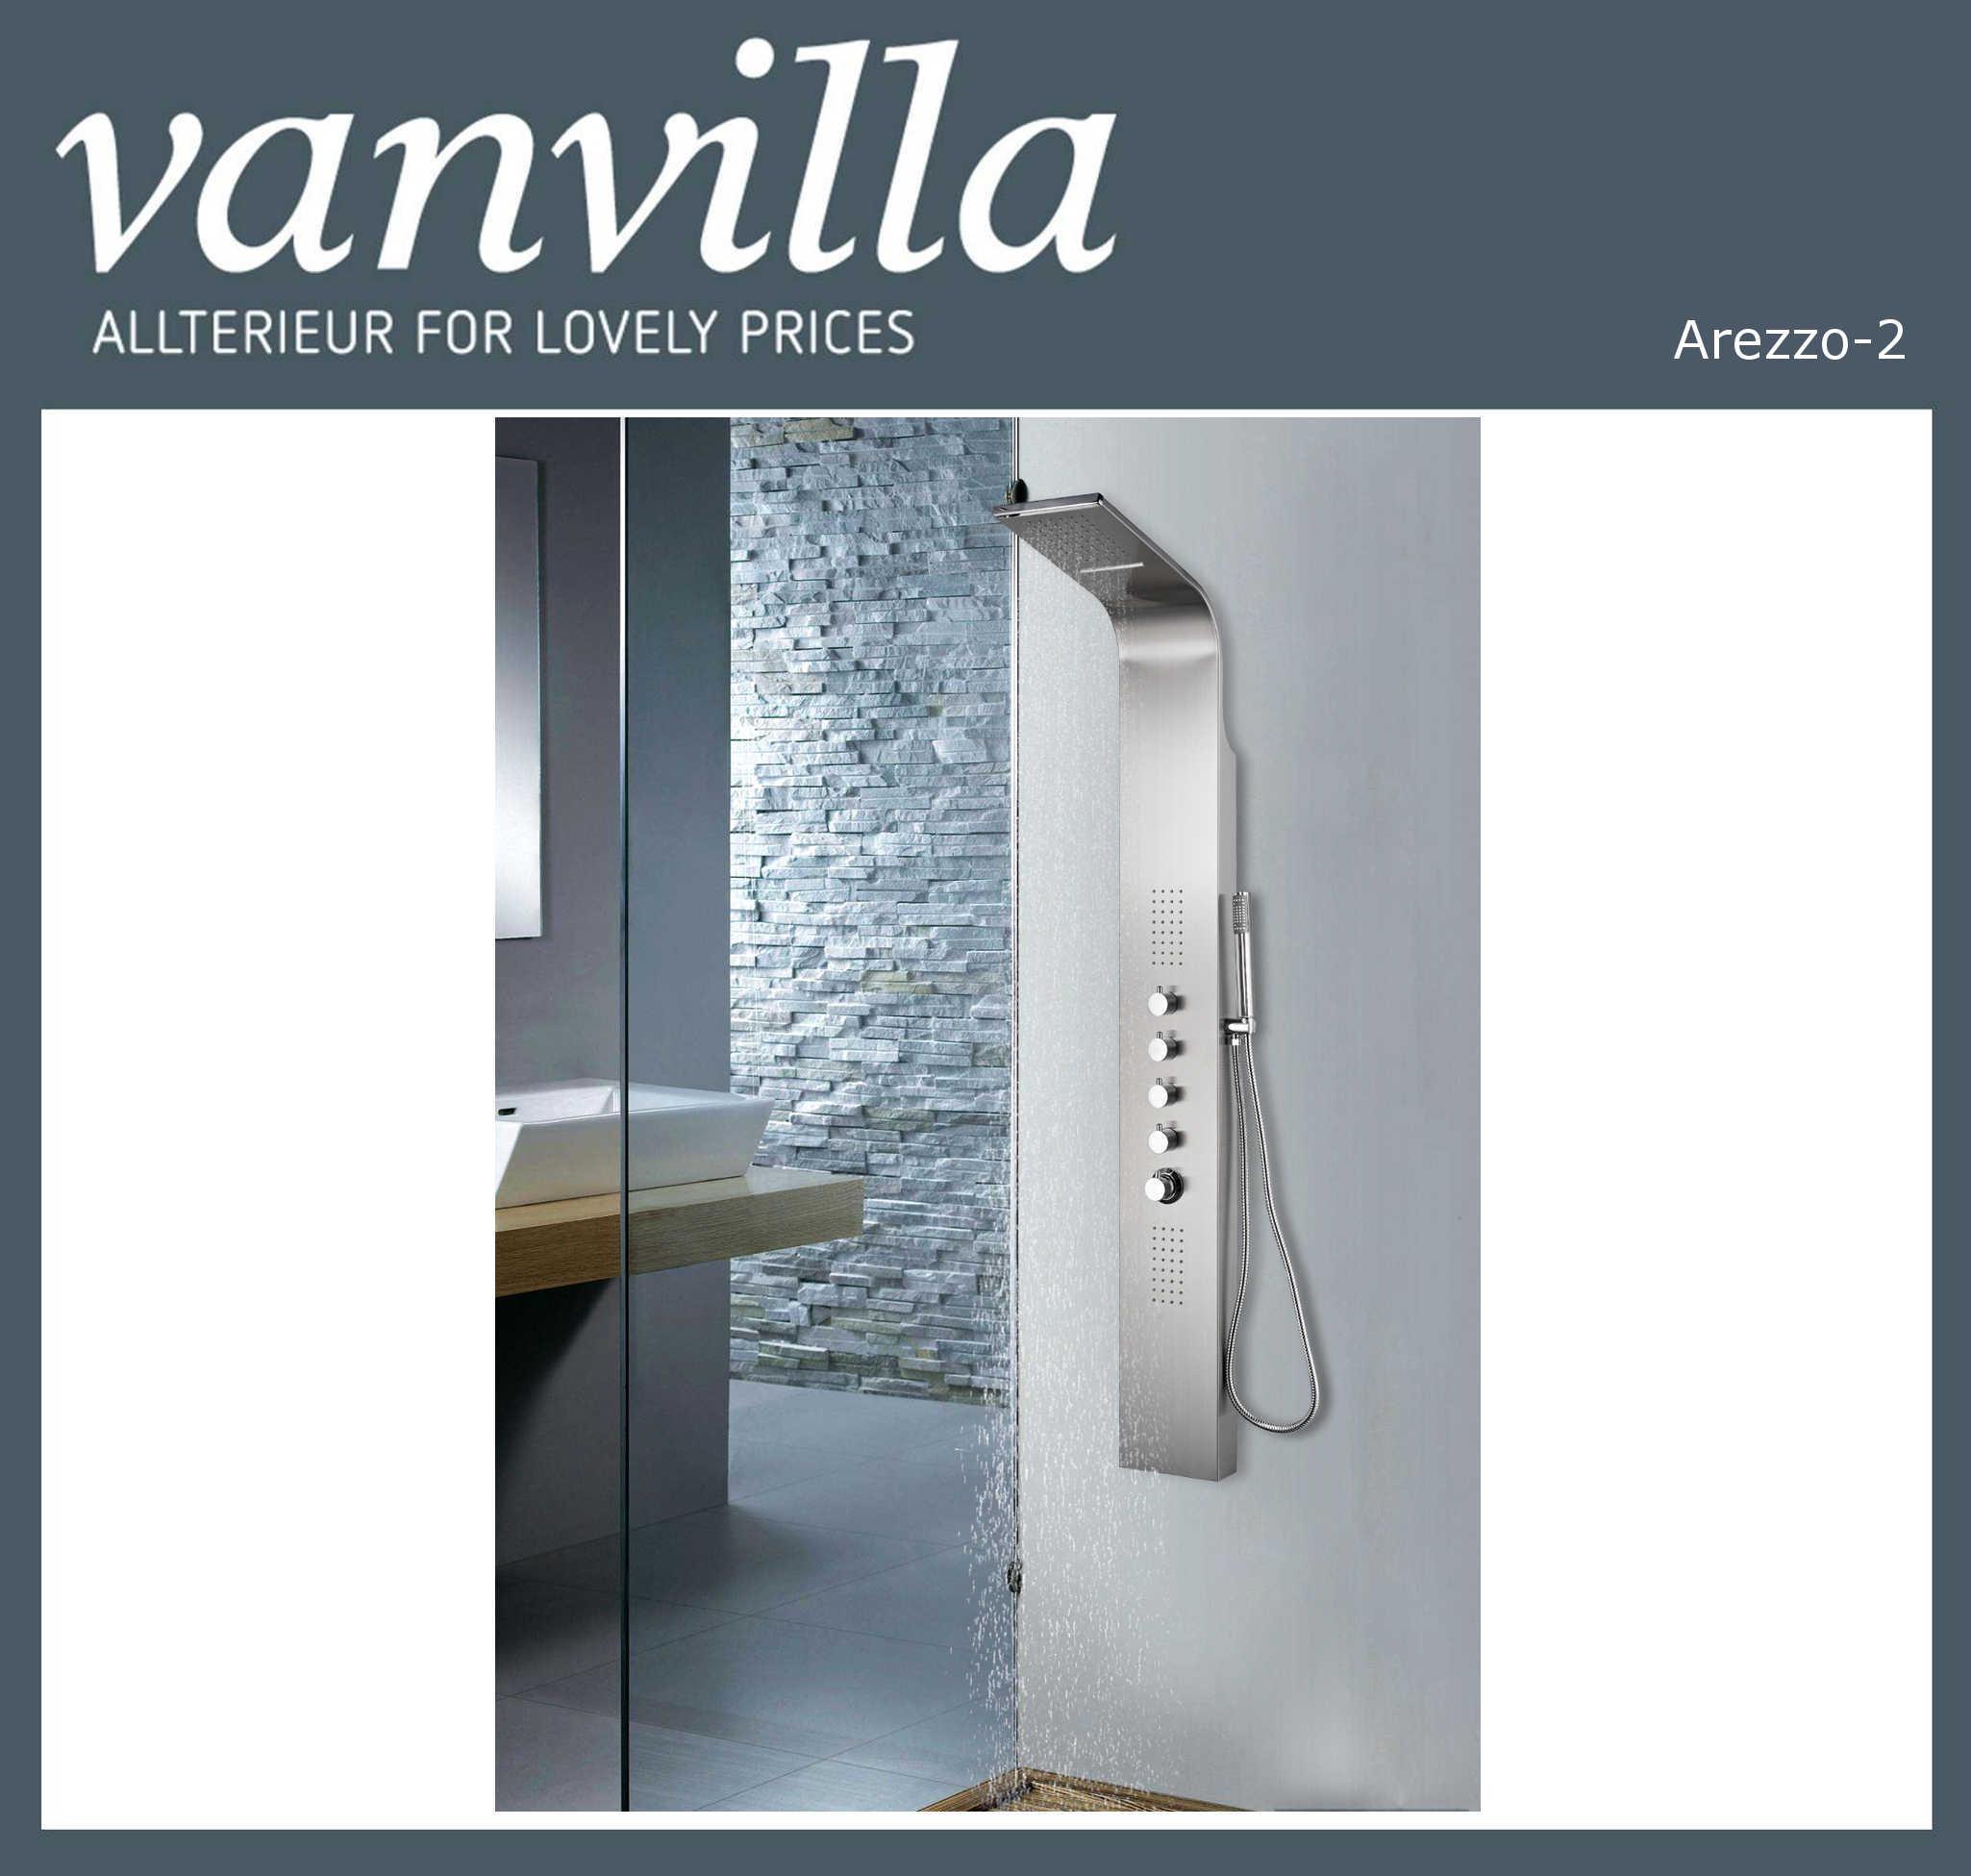 vanvilla Duschpaneel Arezzo-2 Edelstahl Thermostat Schwall- u. Regenbrause